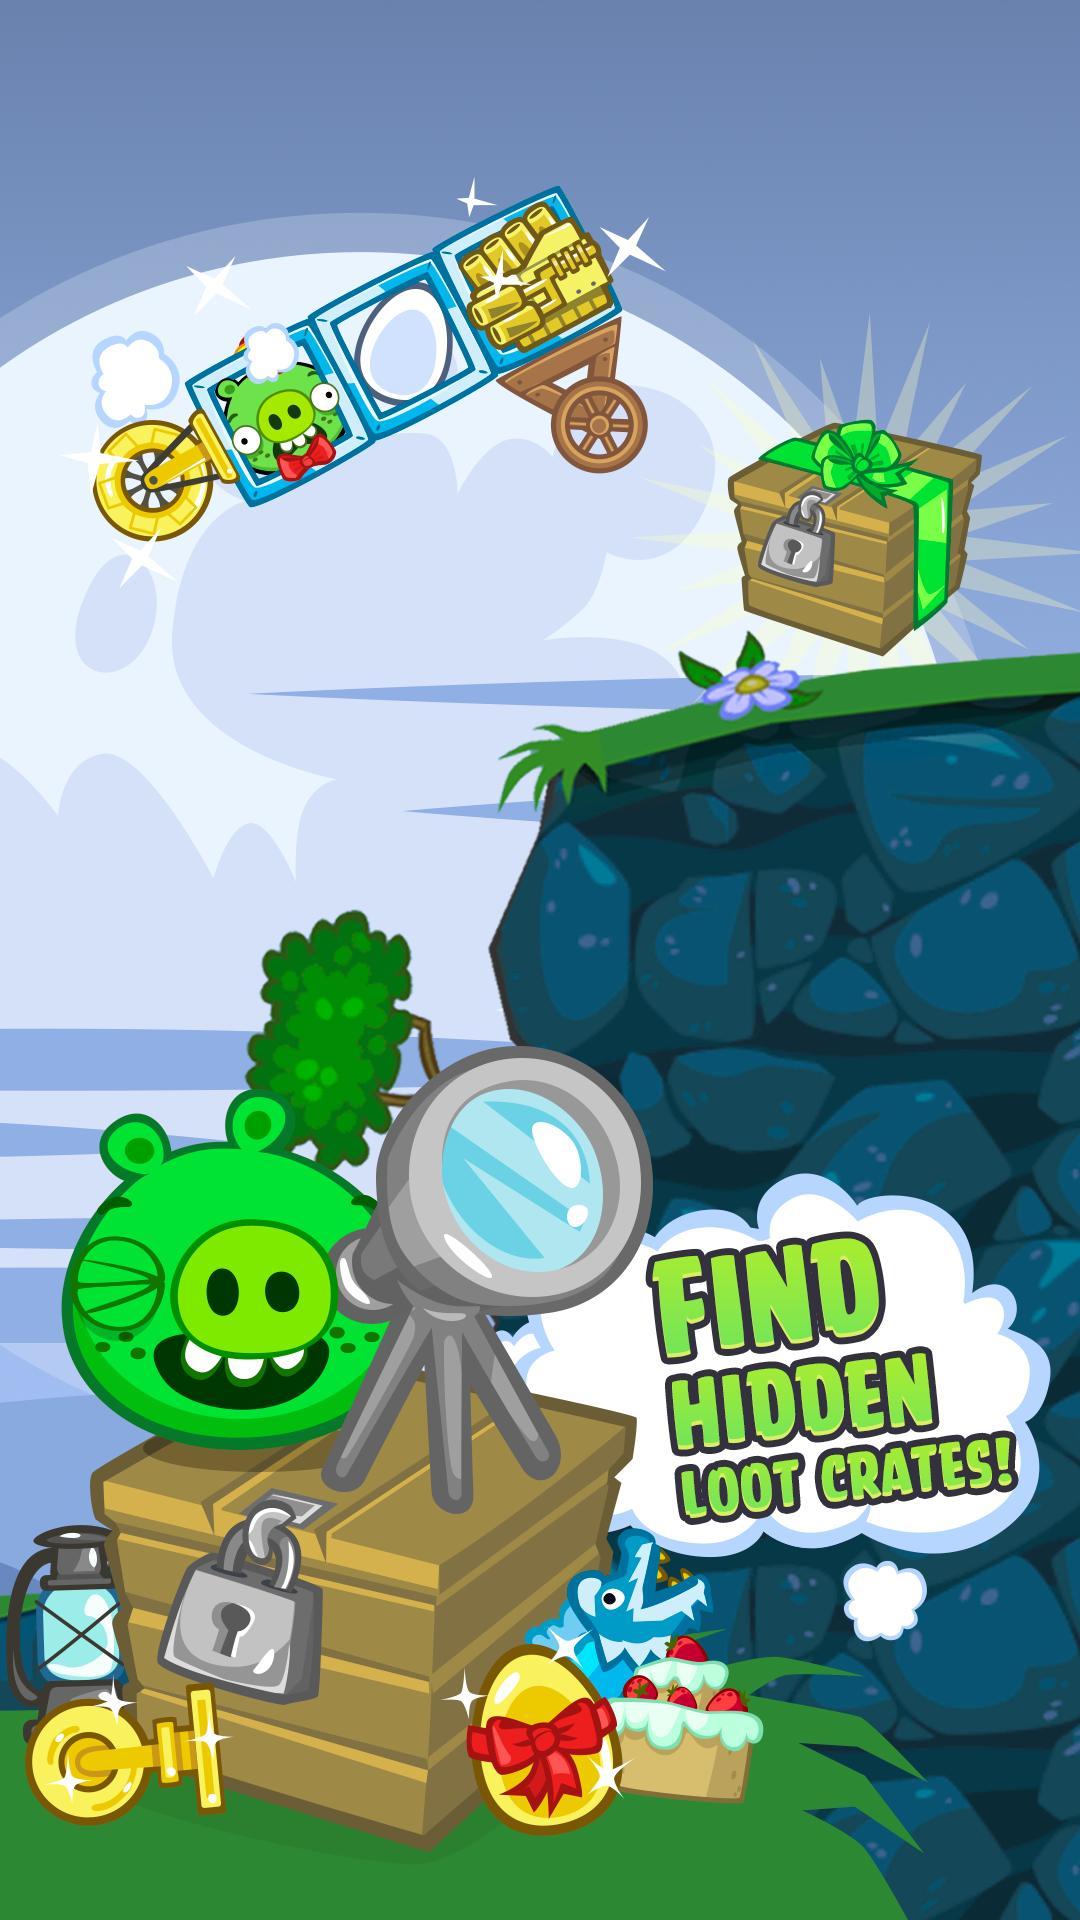 Bad Piggies 2.3.8 Screenshot 14